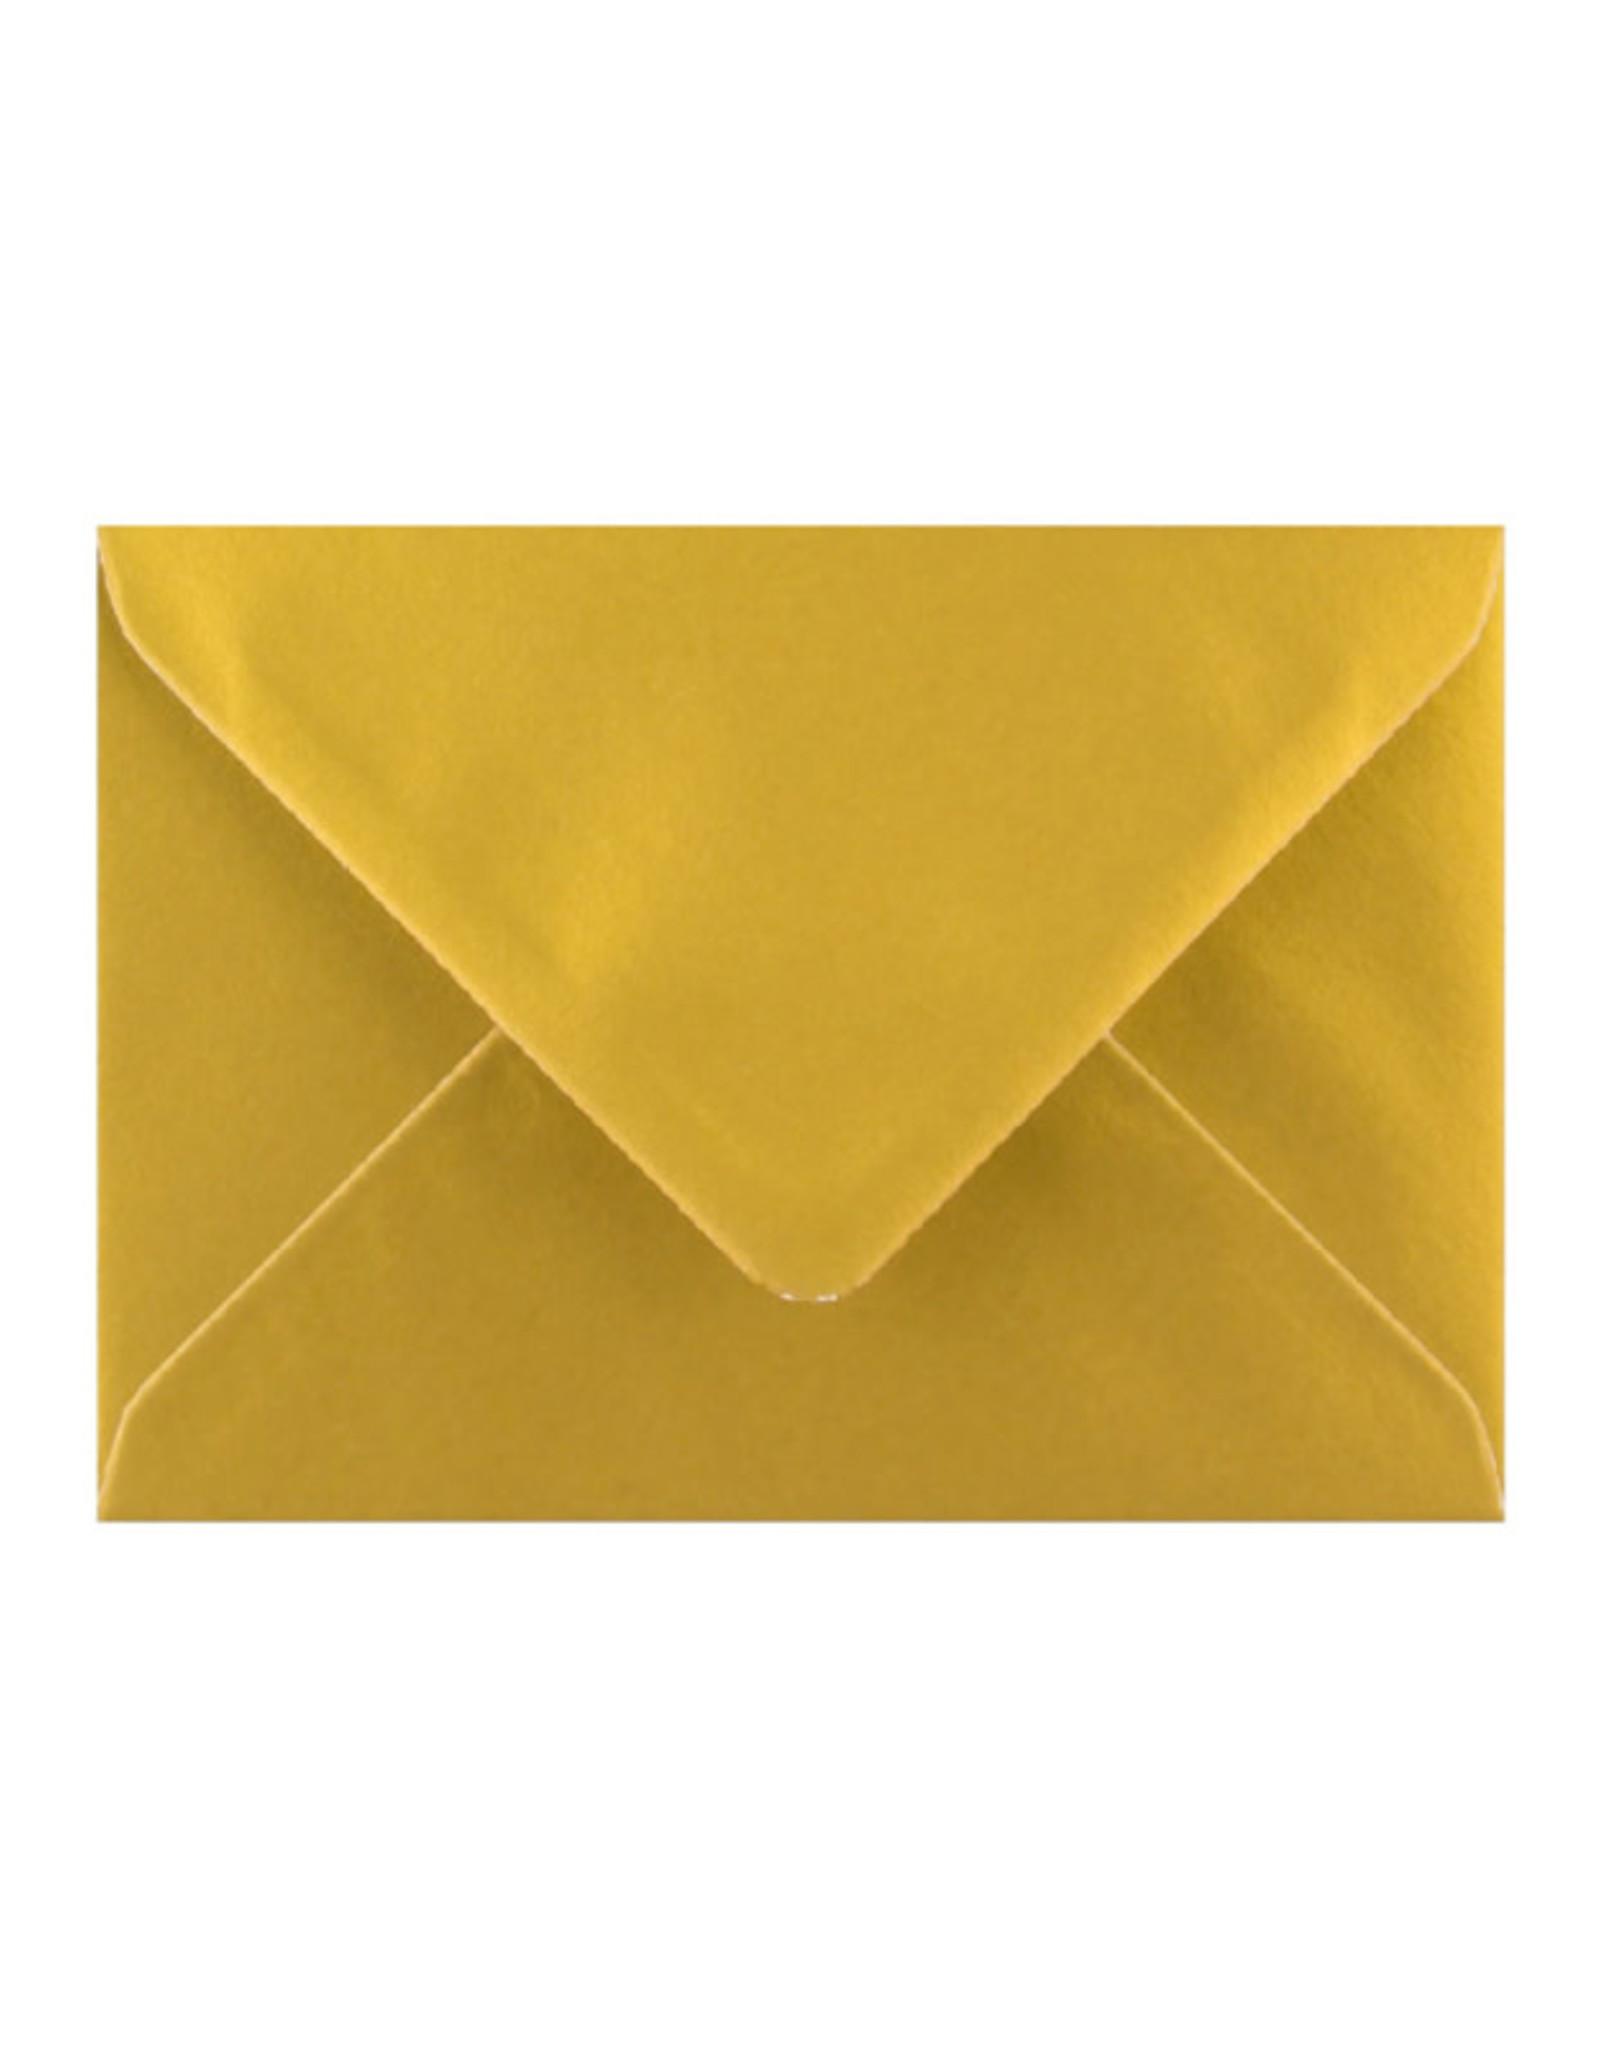 By romi by romi kaart a6 + gouden envelop: geluk